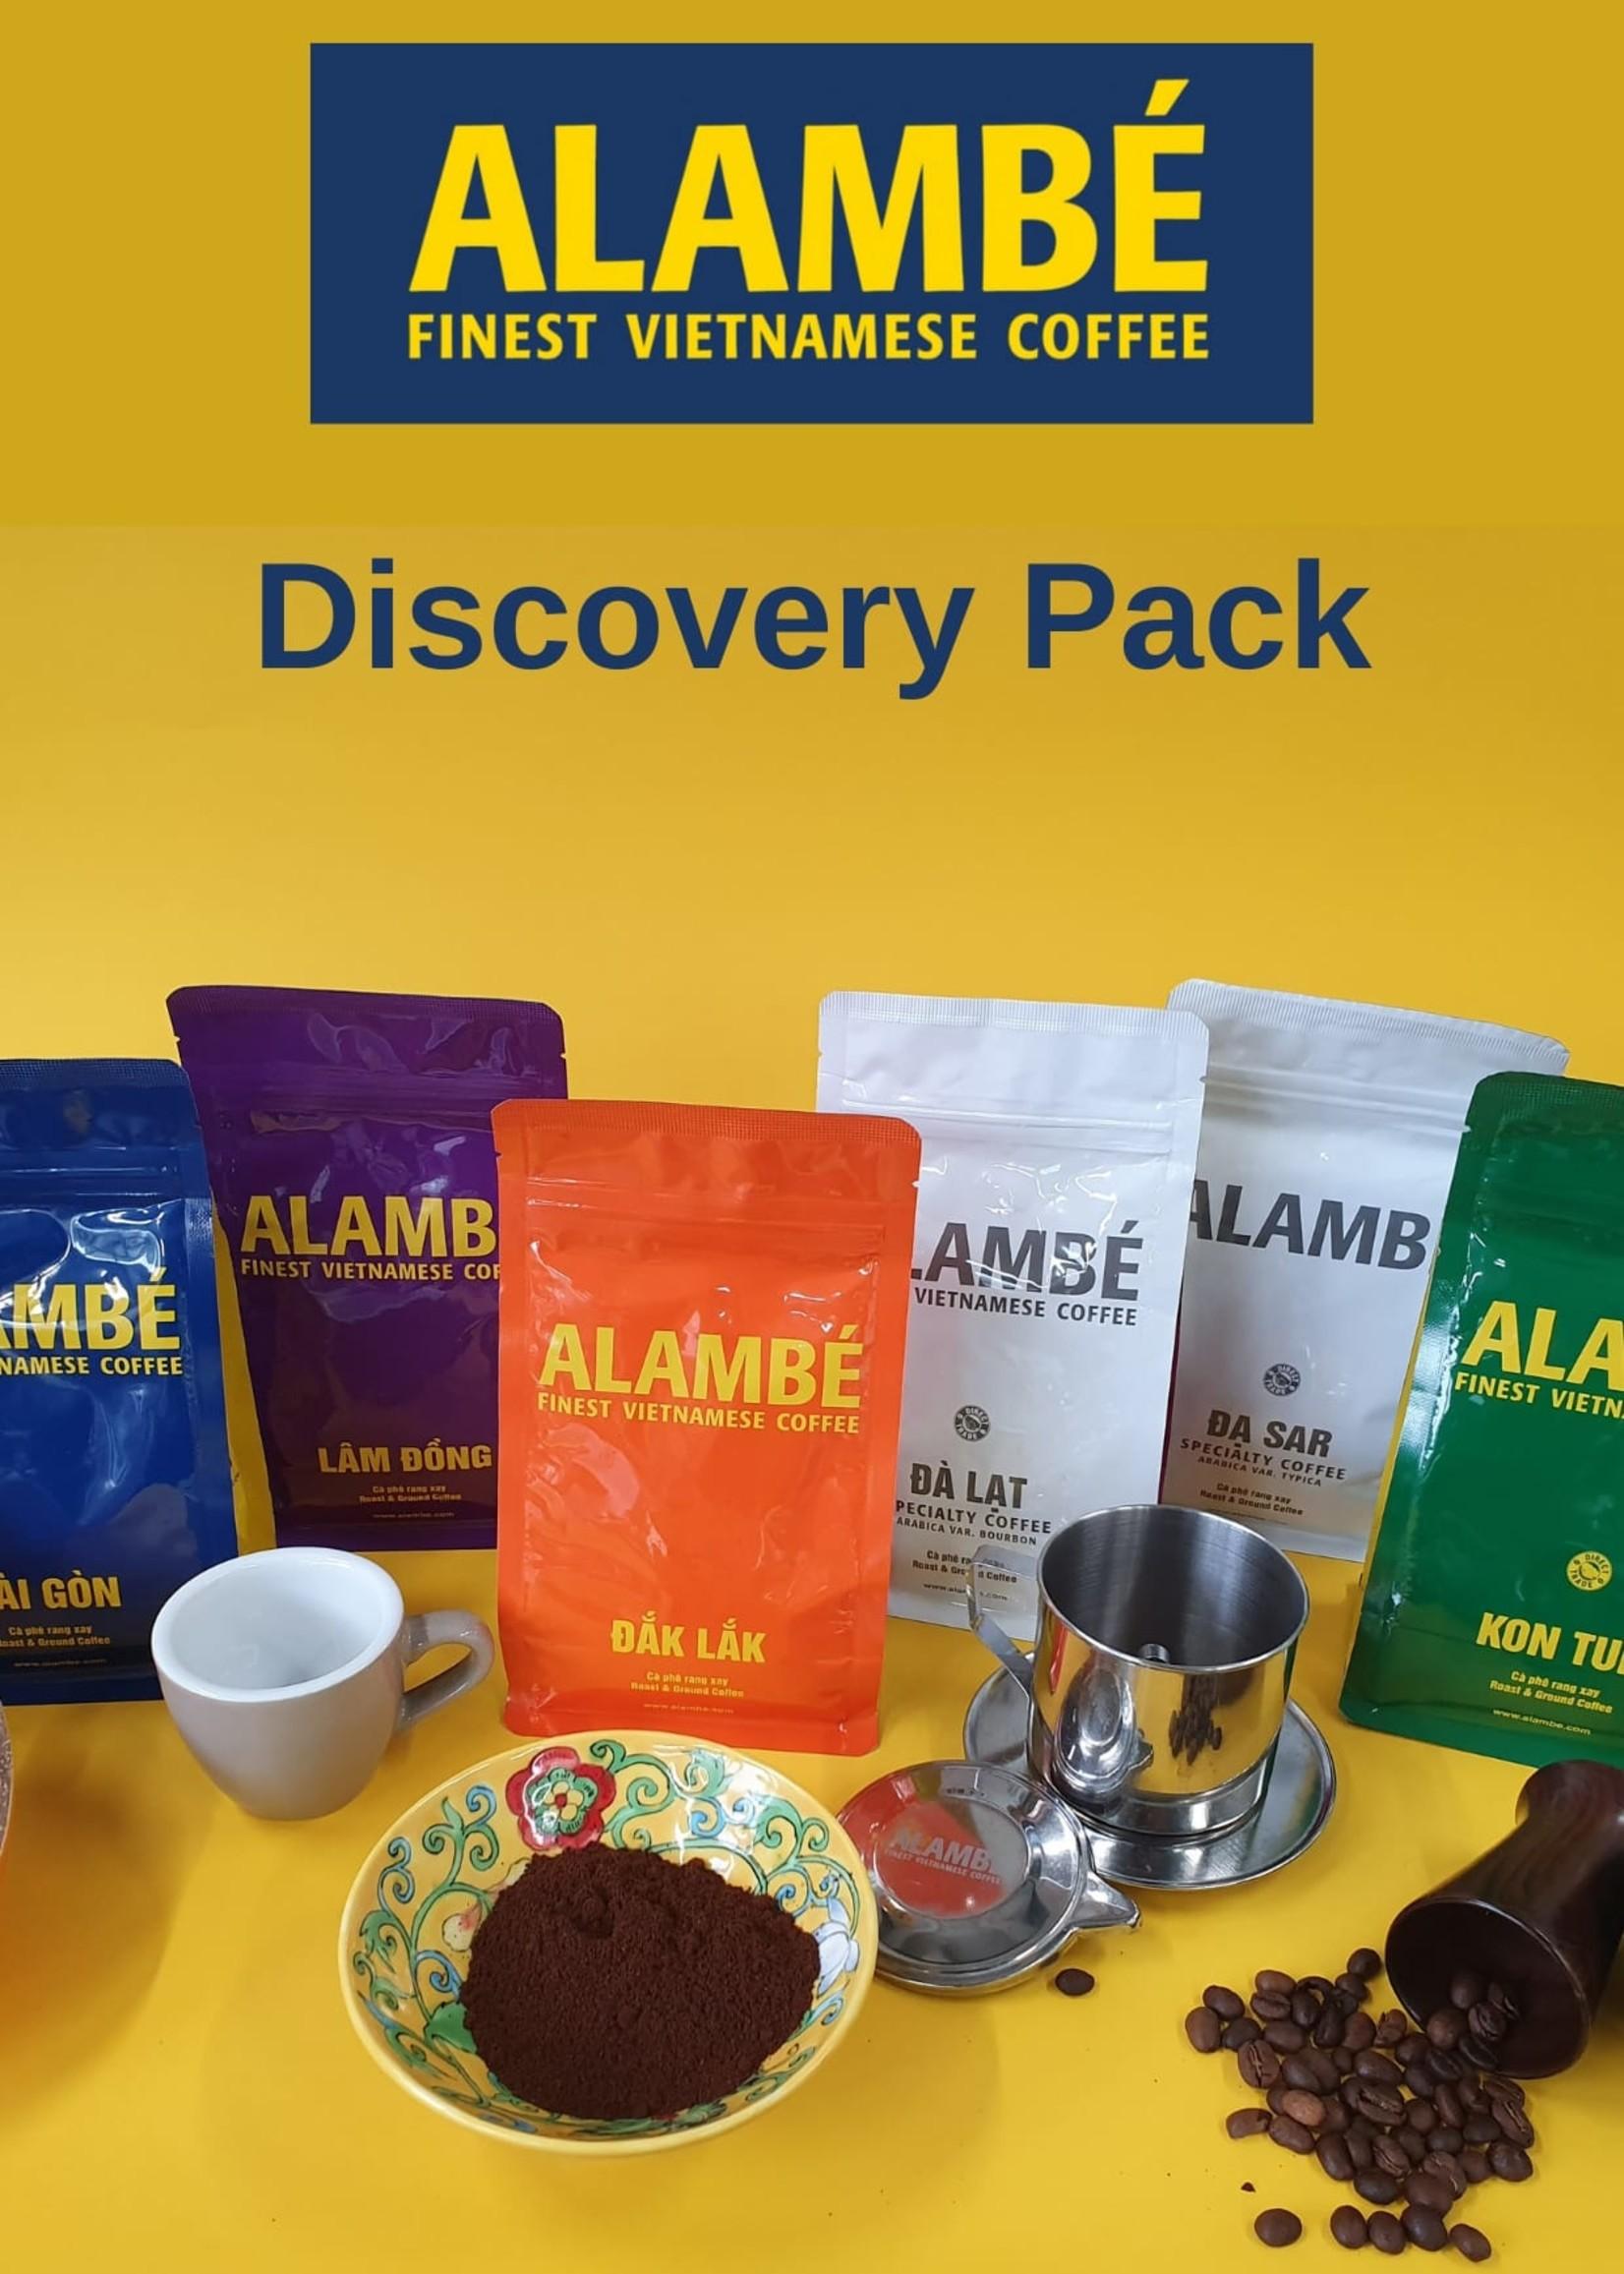 Alambé - Finest Vietnamese Coffee The Alambé Coffee Discovery Pack (whole beans)